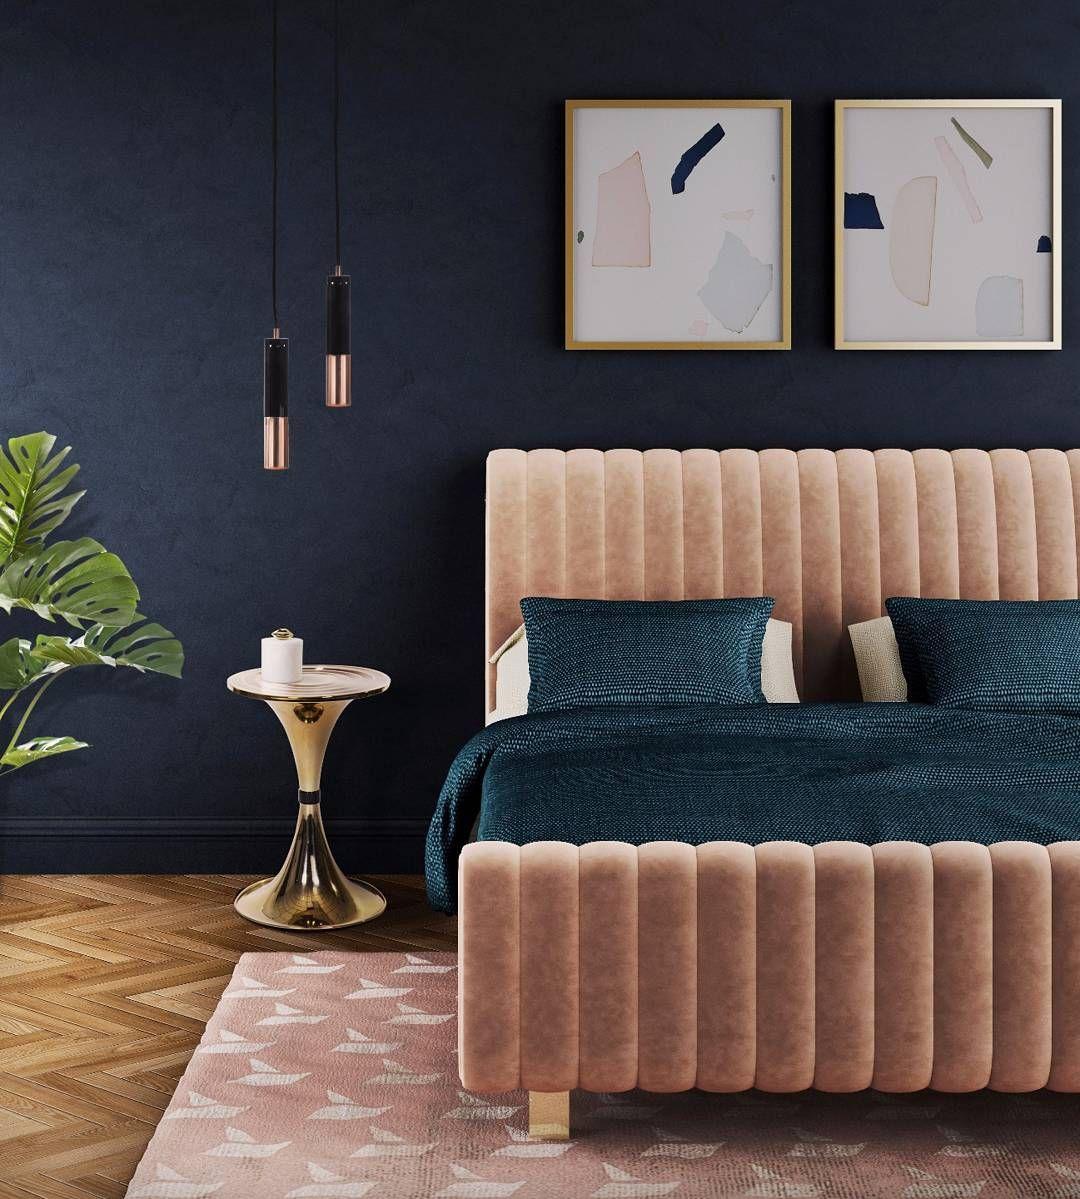 modern bedroom designs%0A Boca do Lobo   bocadolobo  on Instagram   u   cCool and modern bedroom design